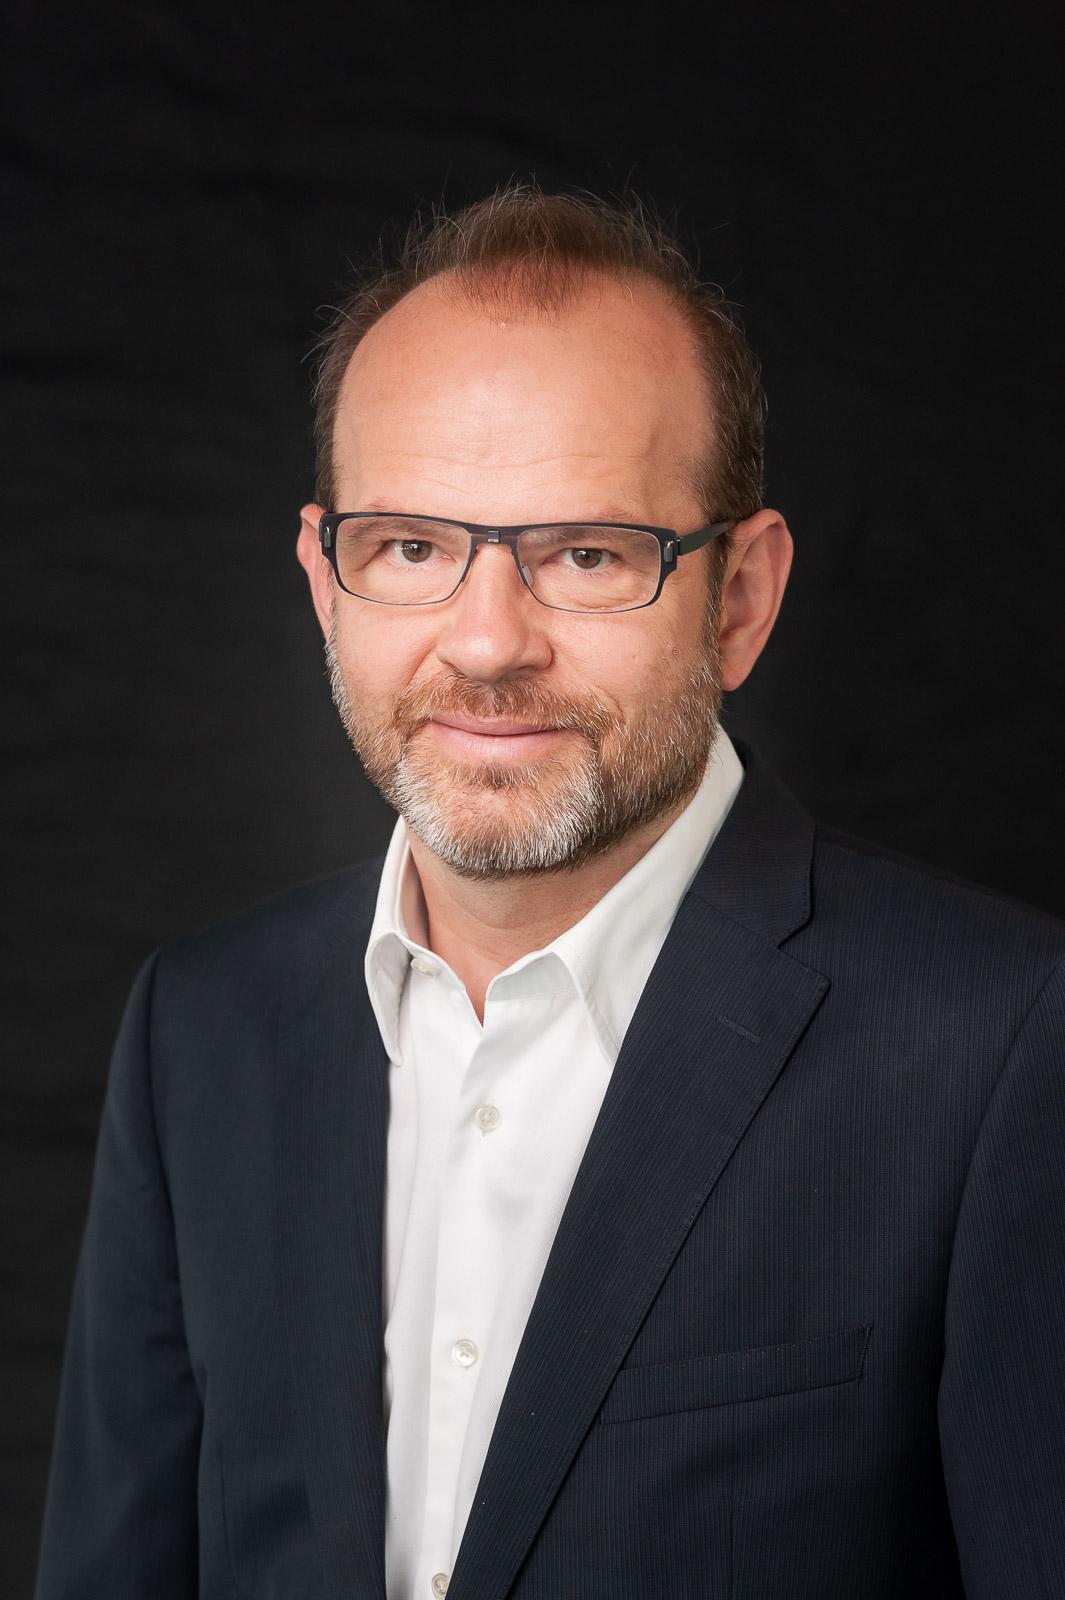 Joachim Reiter